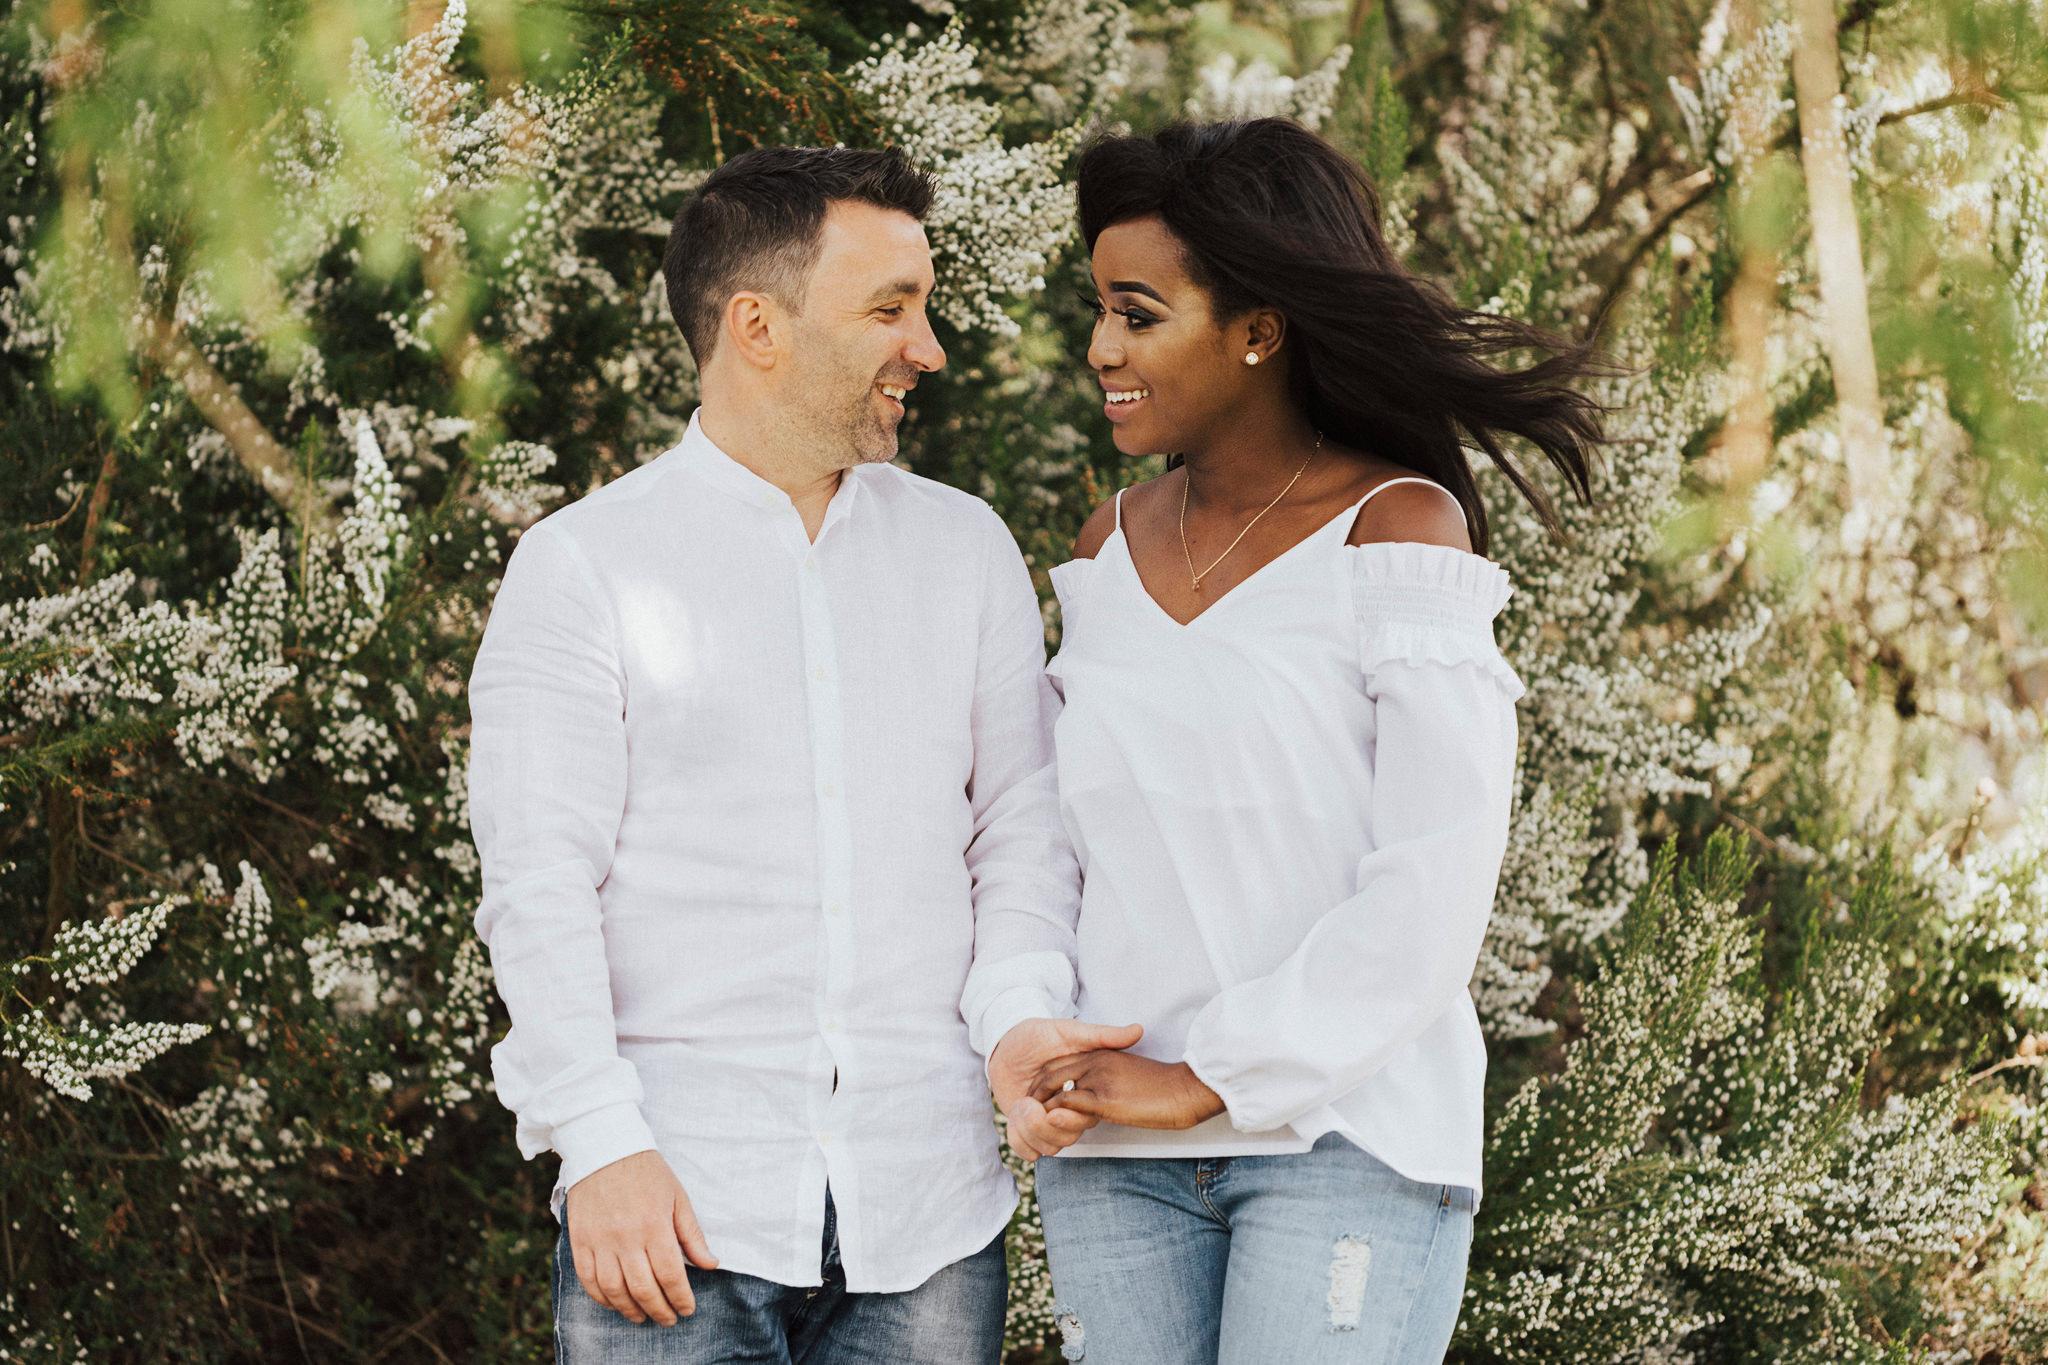 dundee-engagement-wedding-photographer-14.jpg